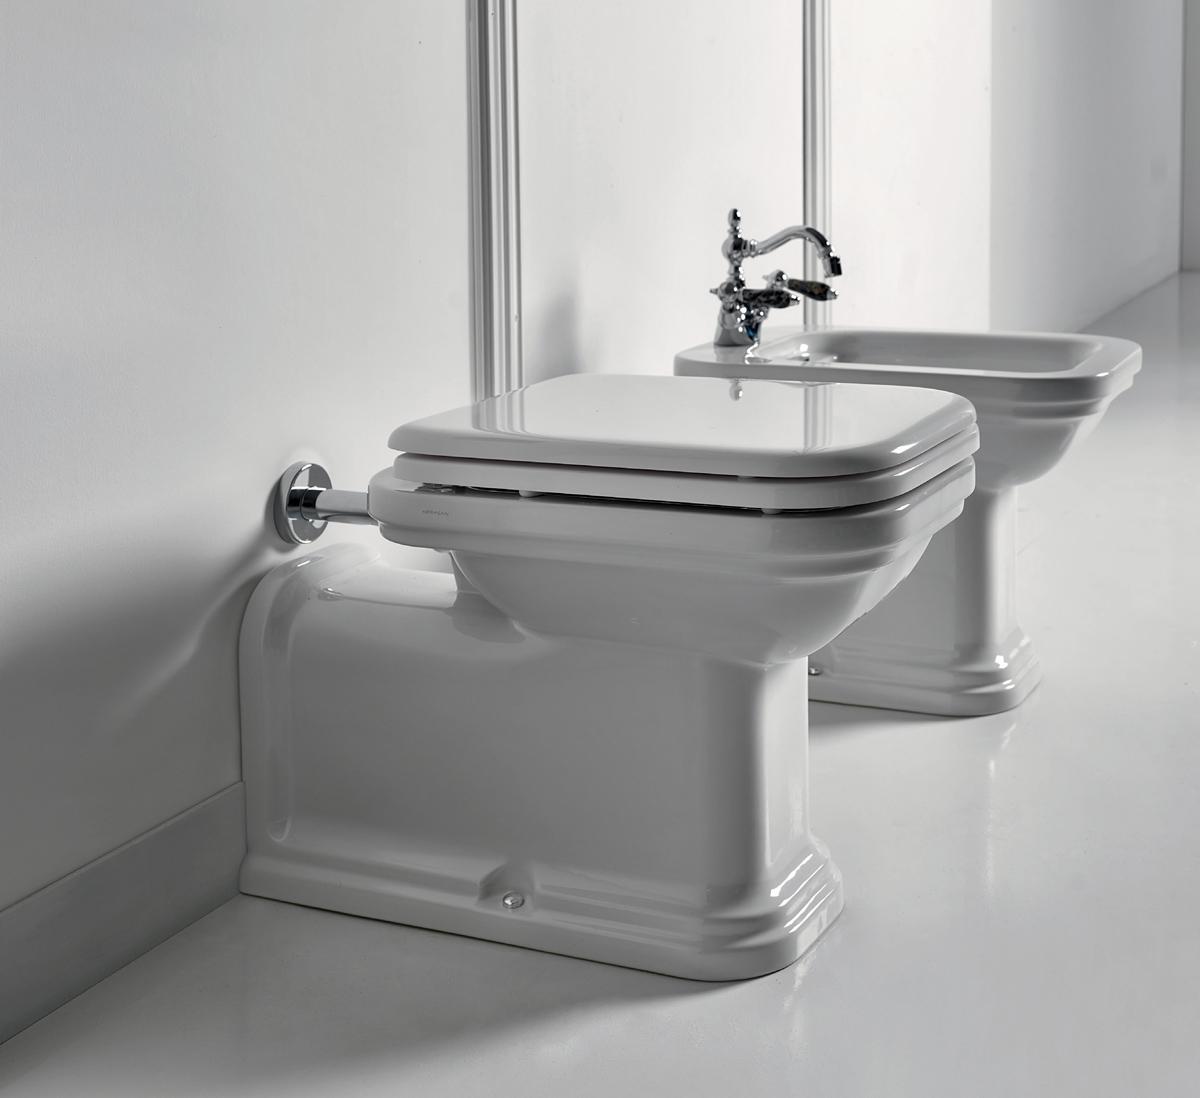 KERASAN sanitari serie WALDORF: IL LUSSO ENTRA IN BAGNO